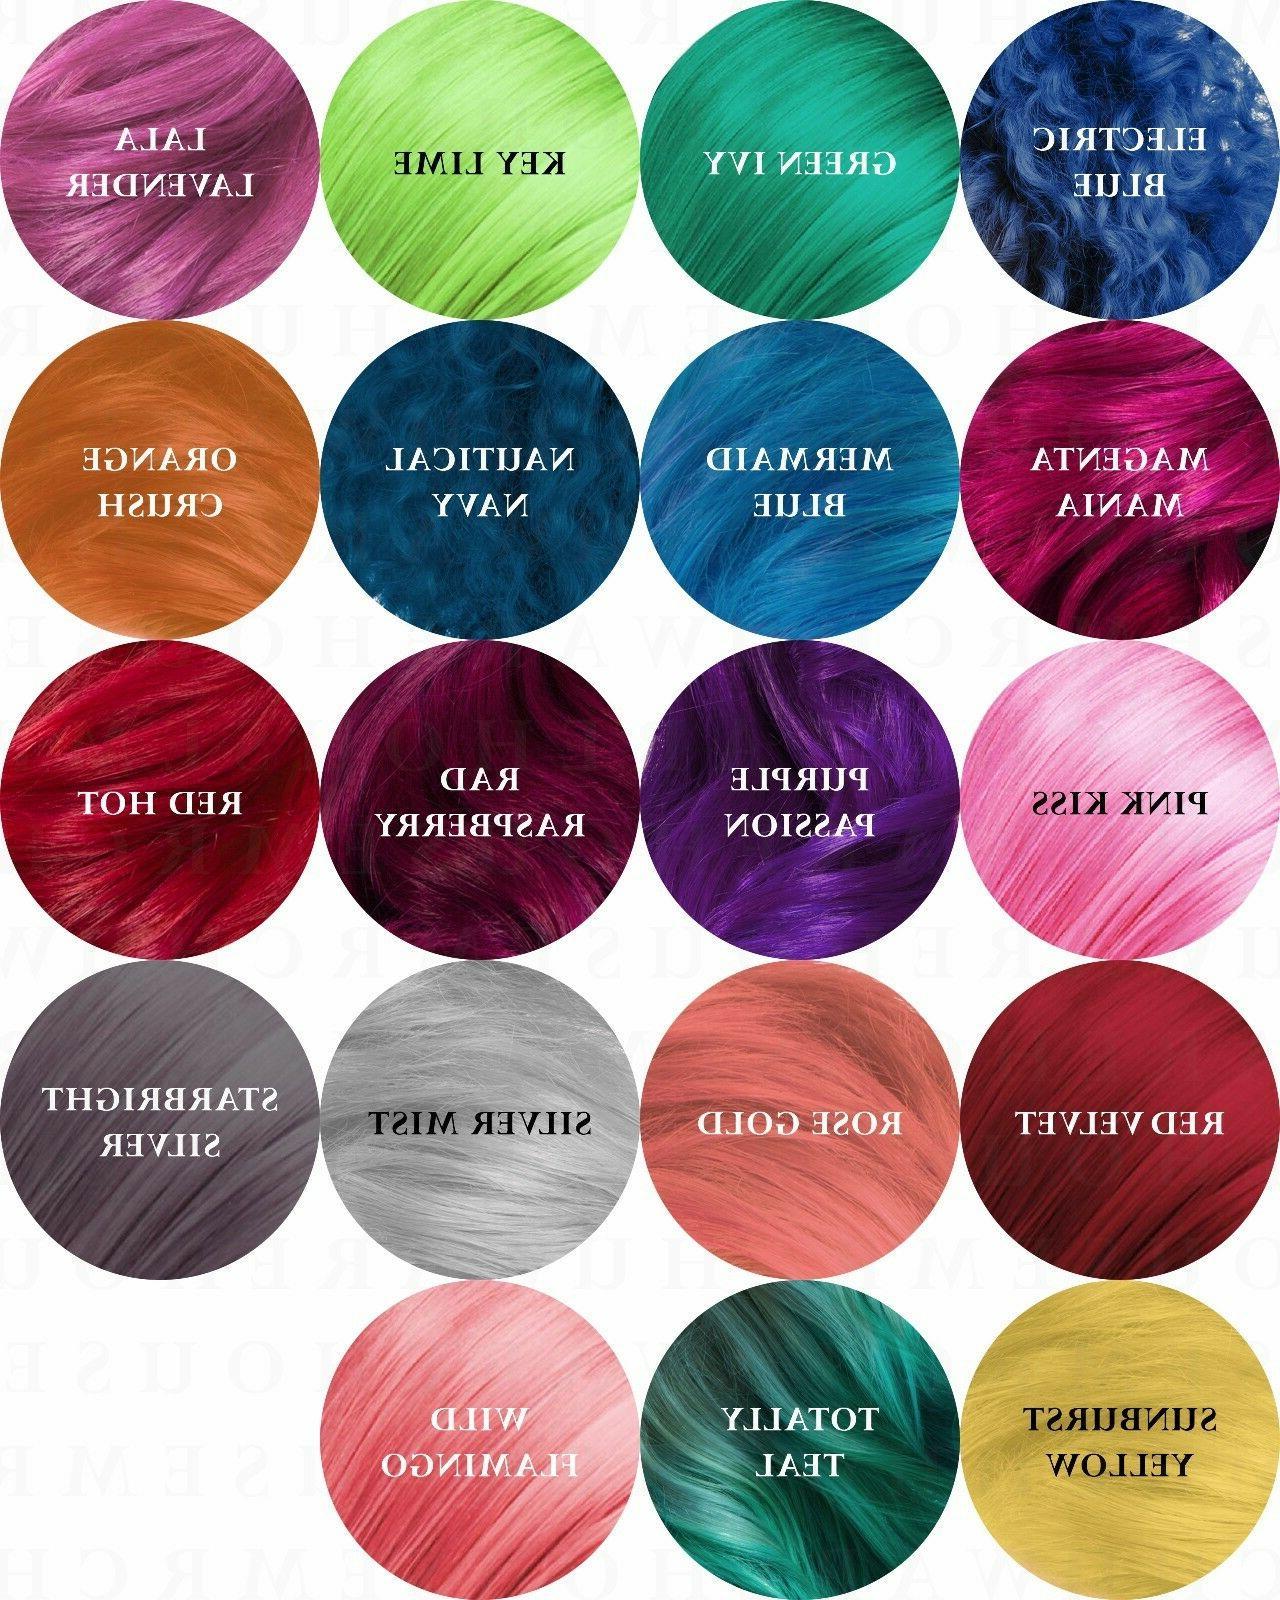 Sparks Long Lasing Bright Permanent Dye Hair Cream mL oz Pick